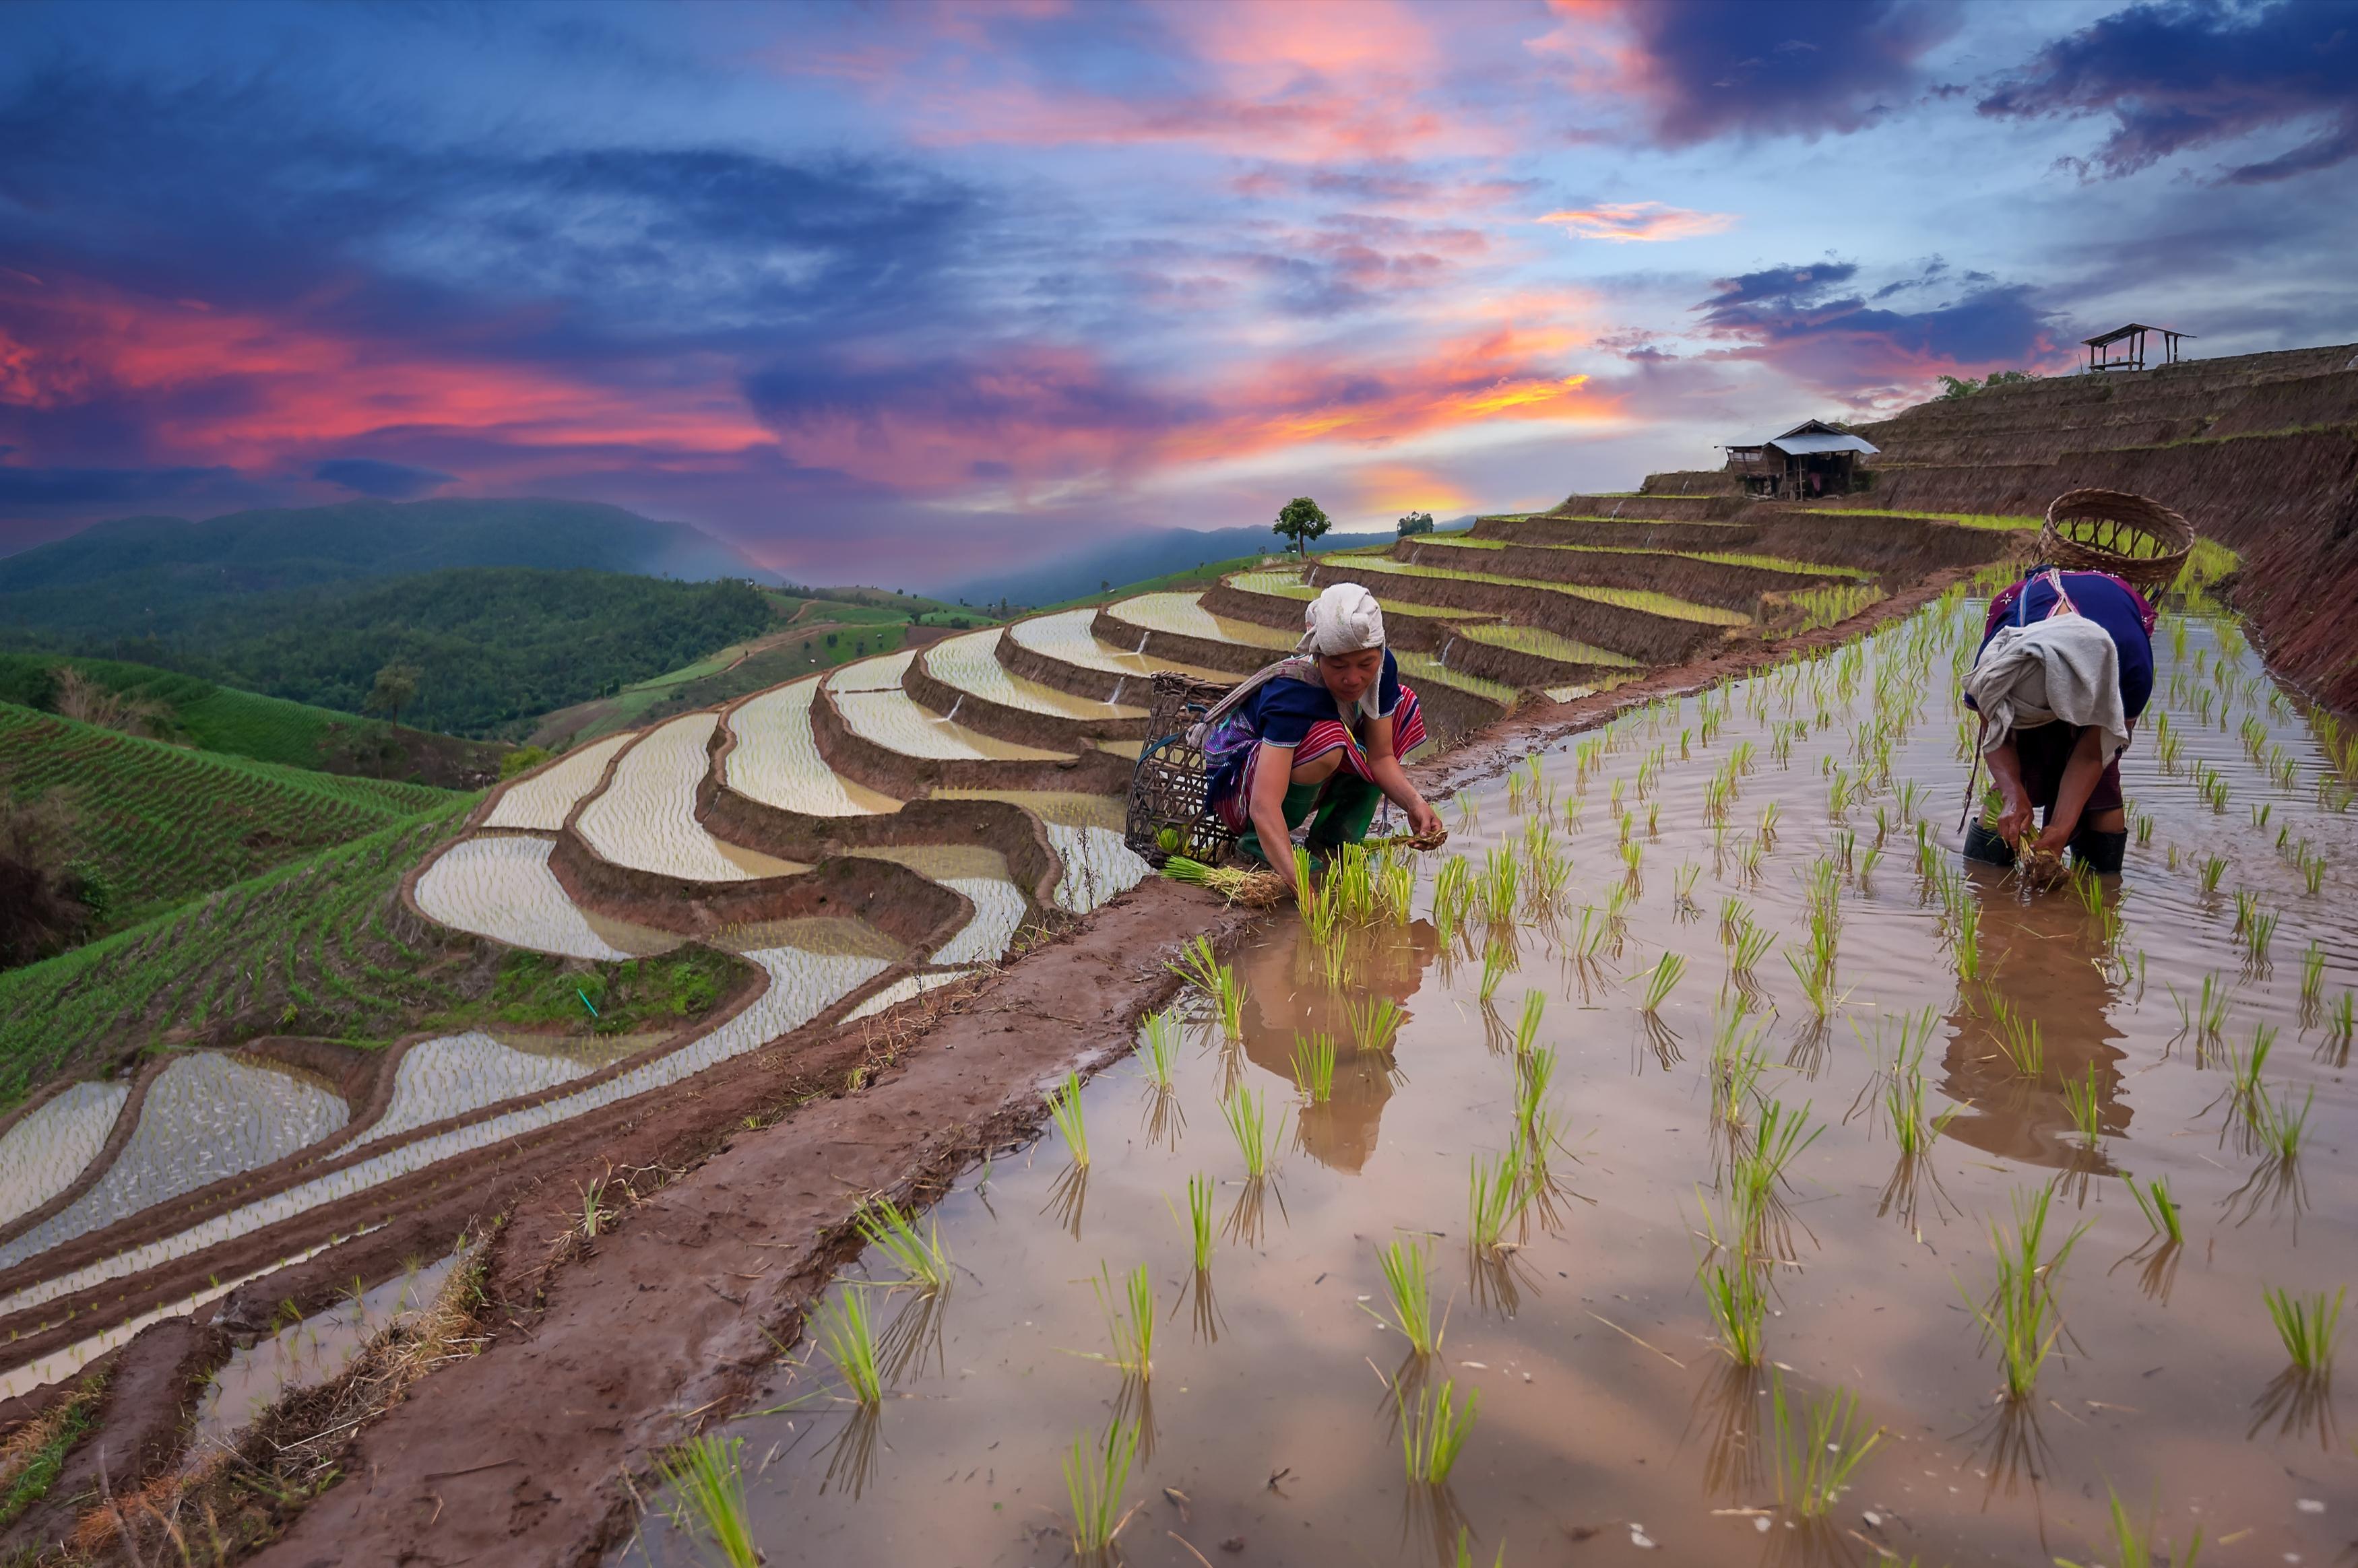 Riceterraces